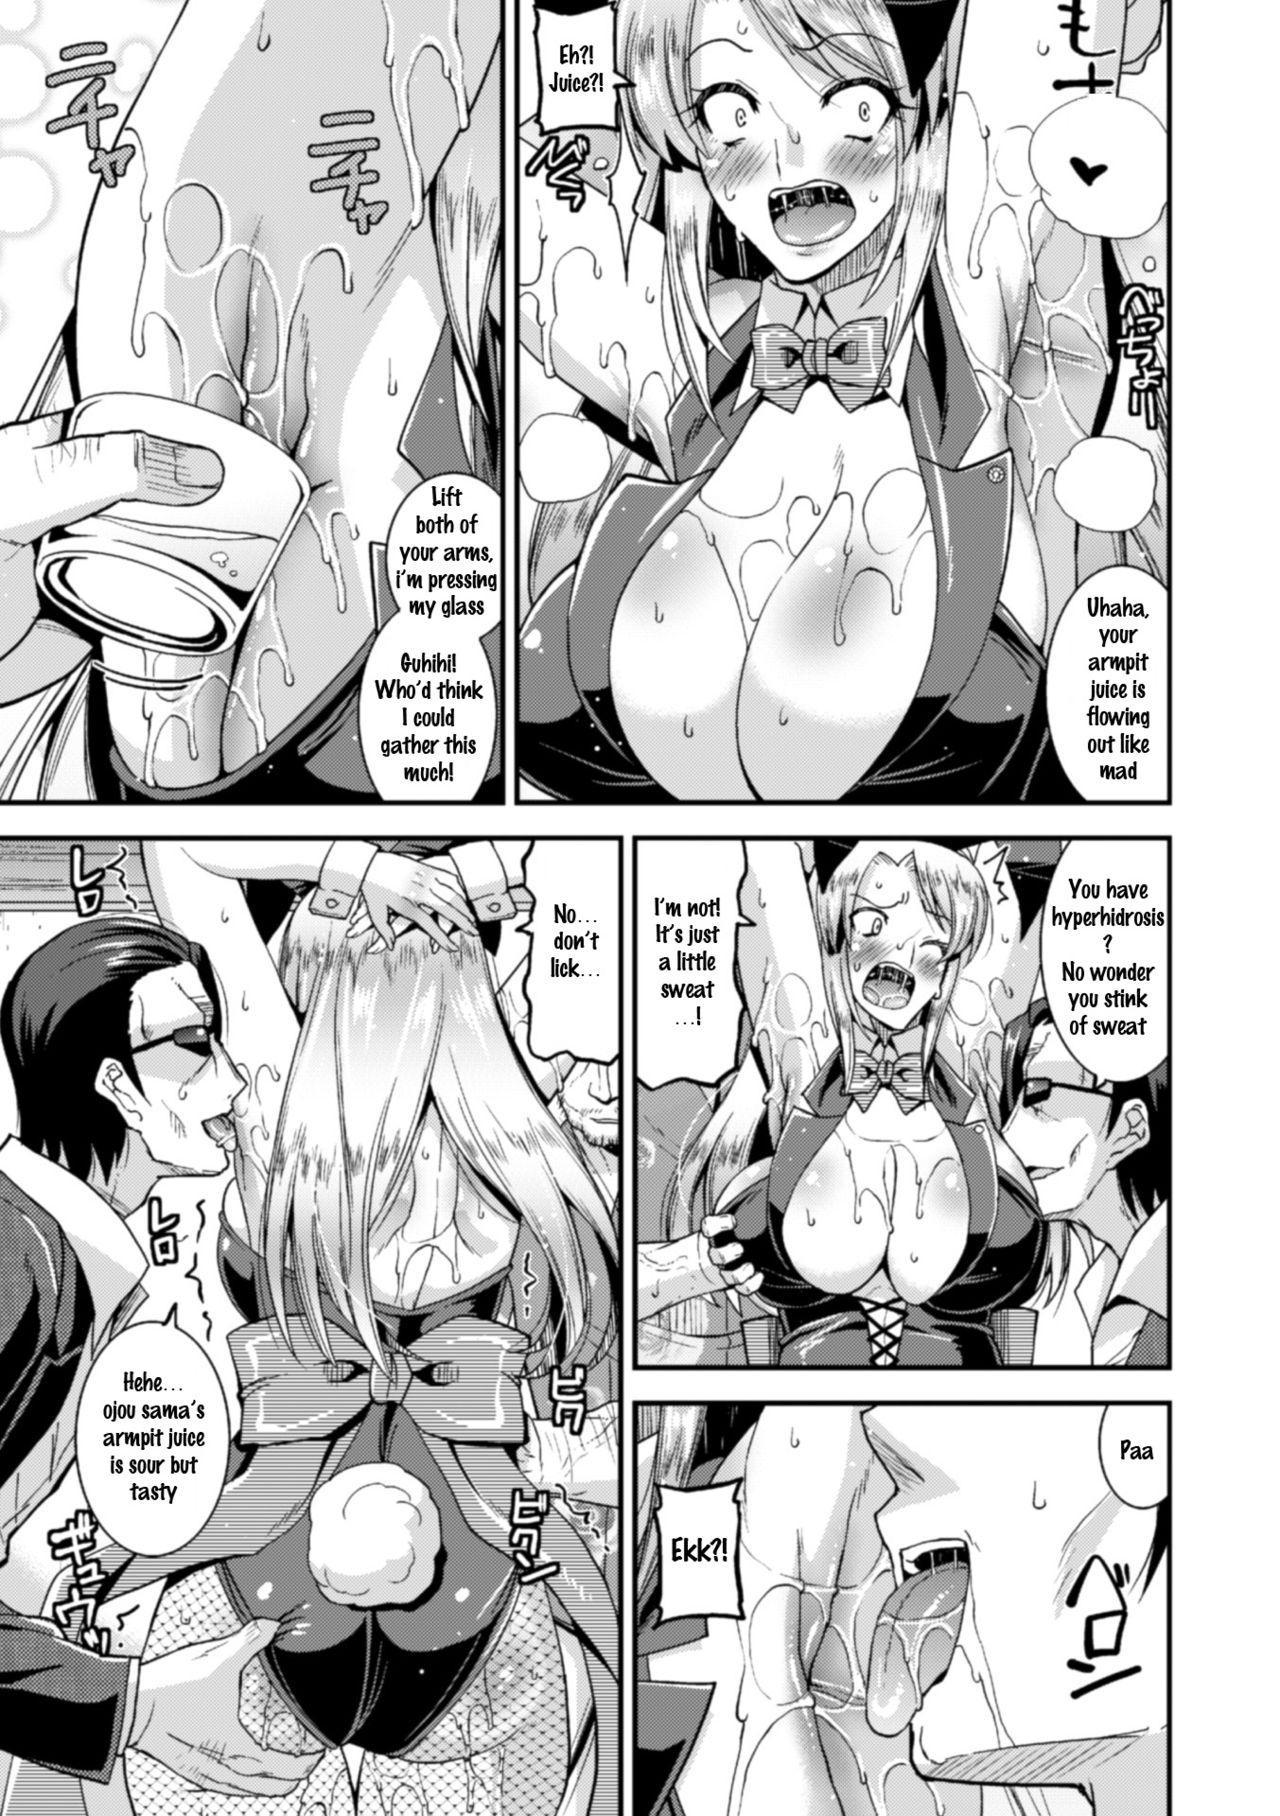 2D Comic Magazine Waki Fechi Bunny Girl Vol.1 Ch 1-3 54